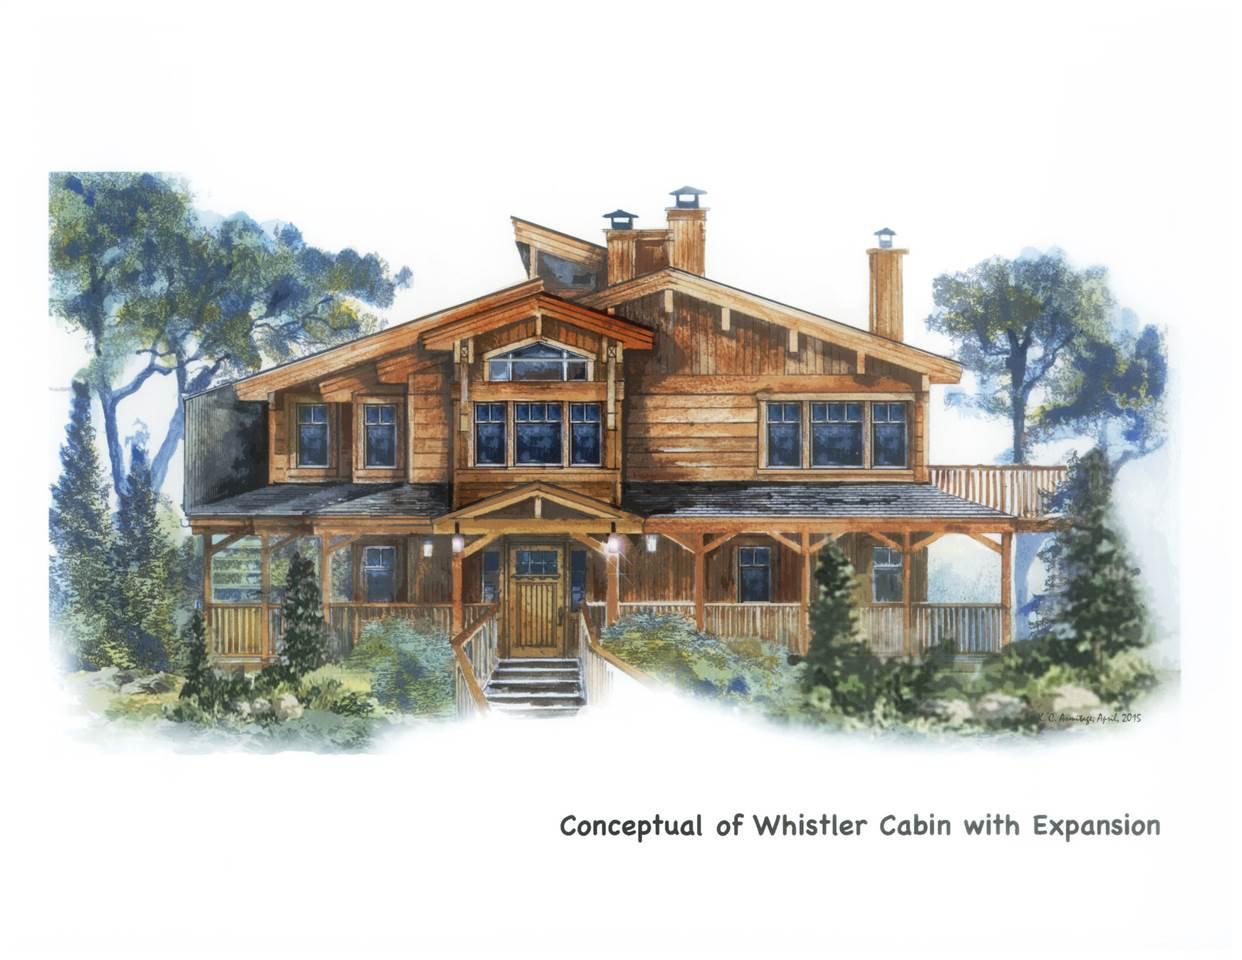 Main Photo: 3035 ST ANTON Way in Whistler: Alta Vista House for sale : MLS®# R2184450